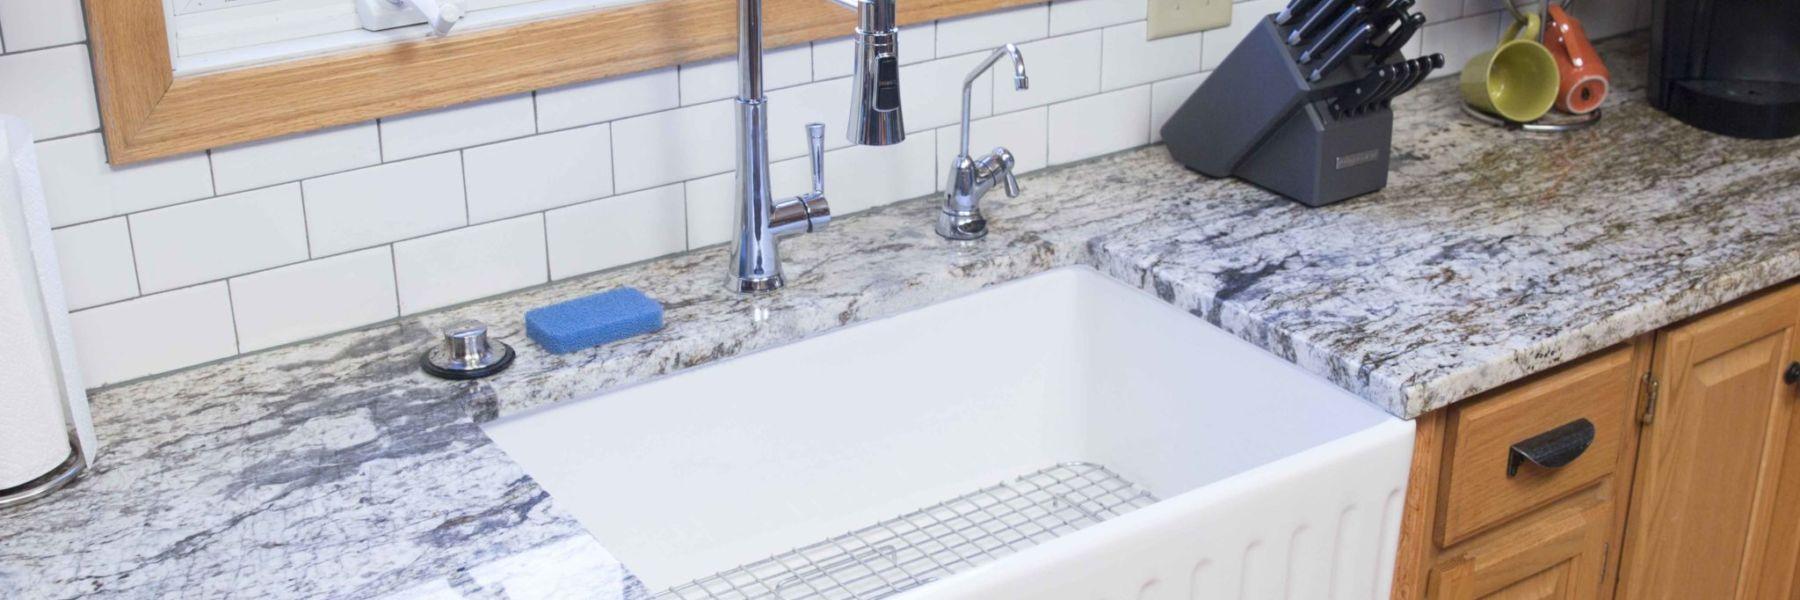 fireclay farmhouse kitchen sink